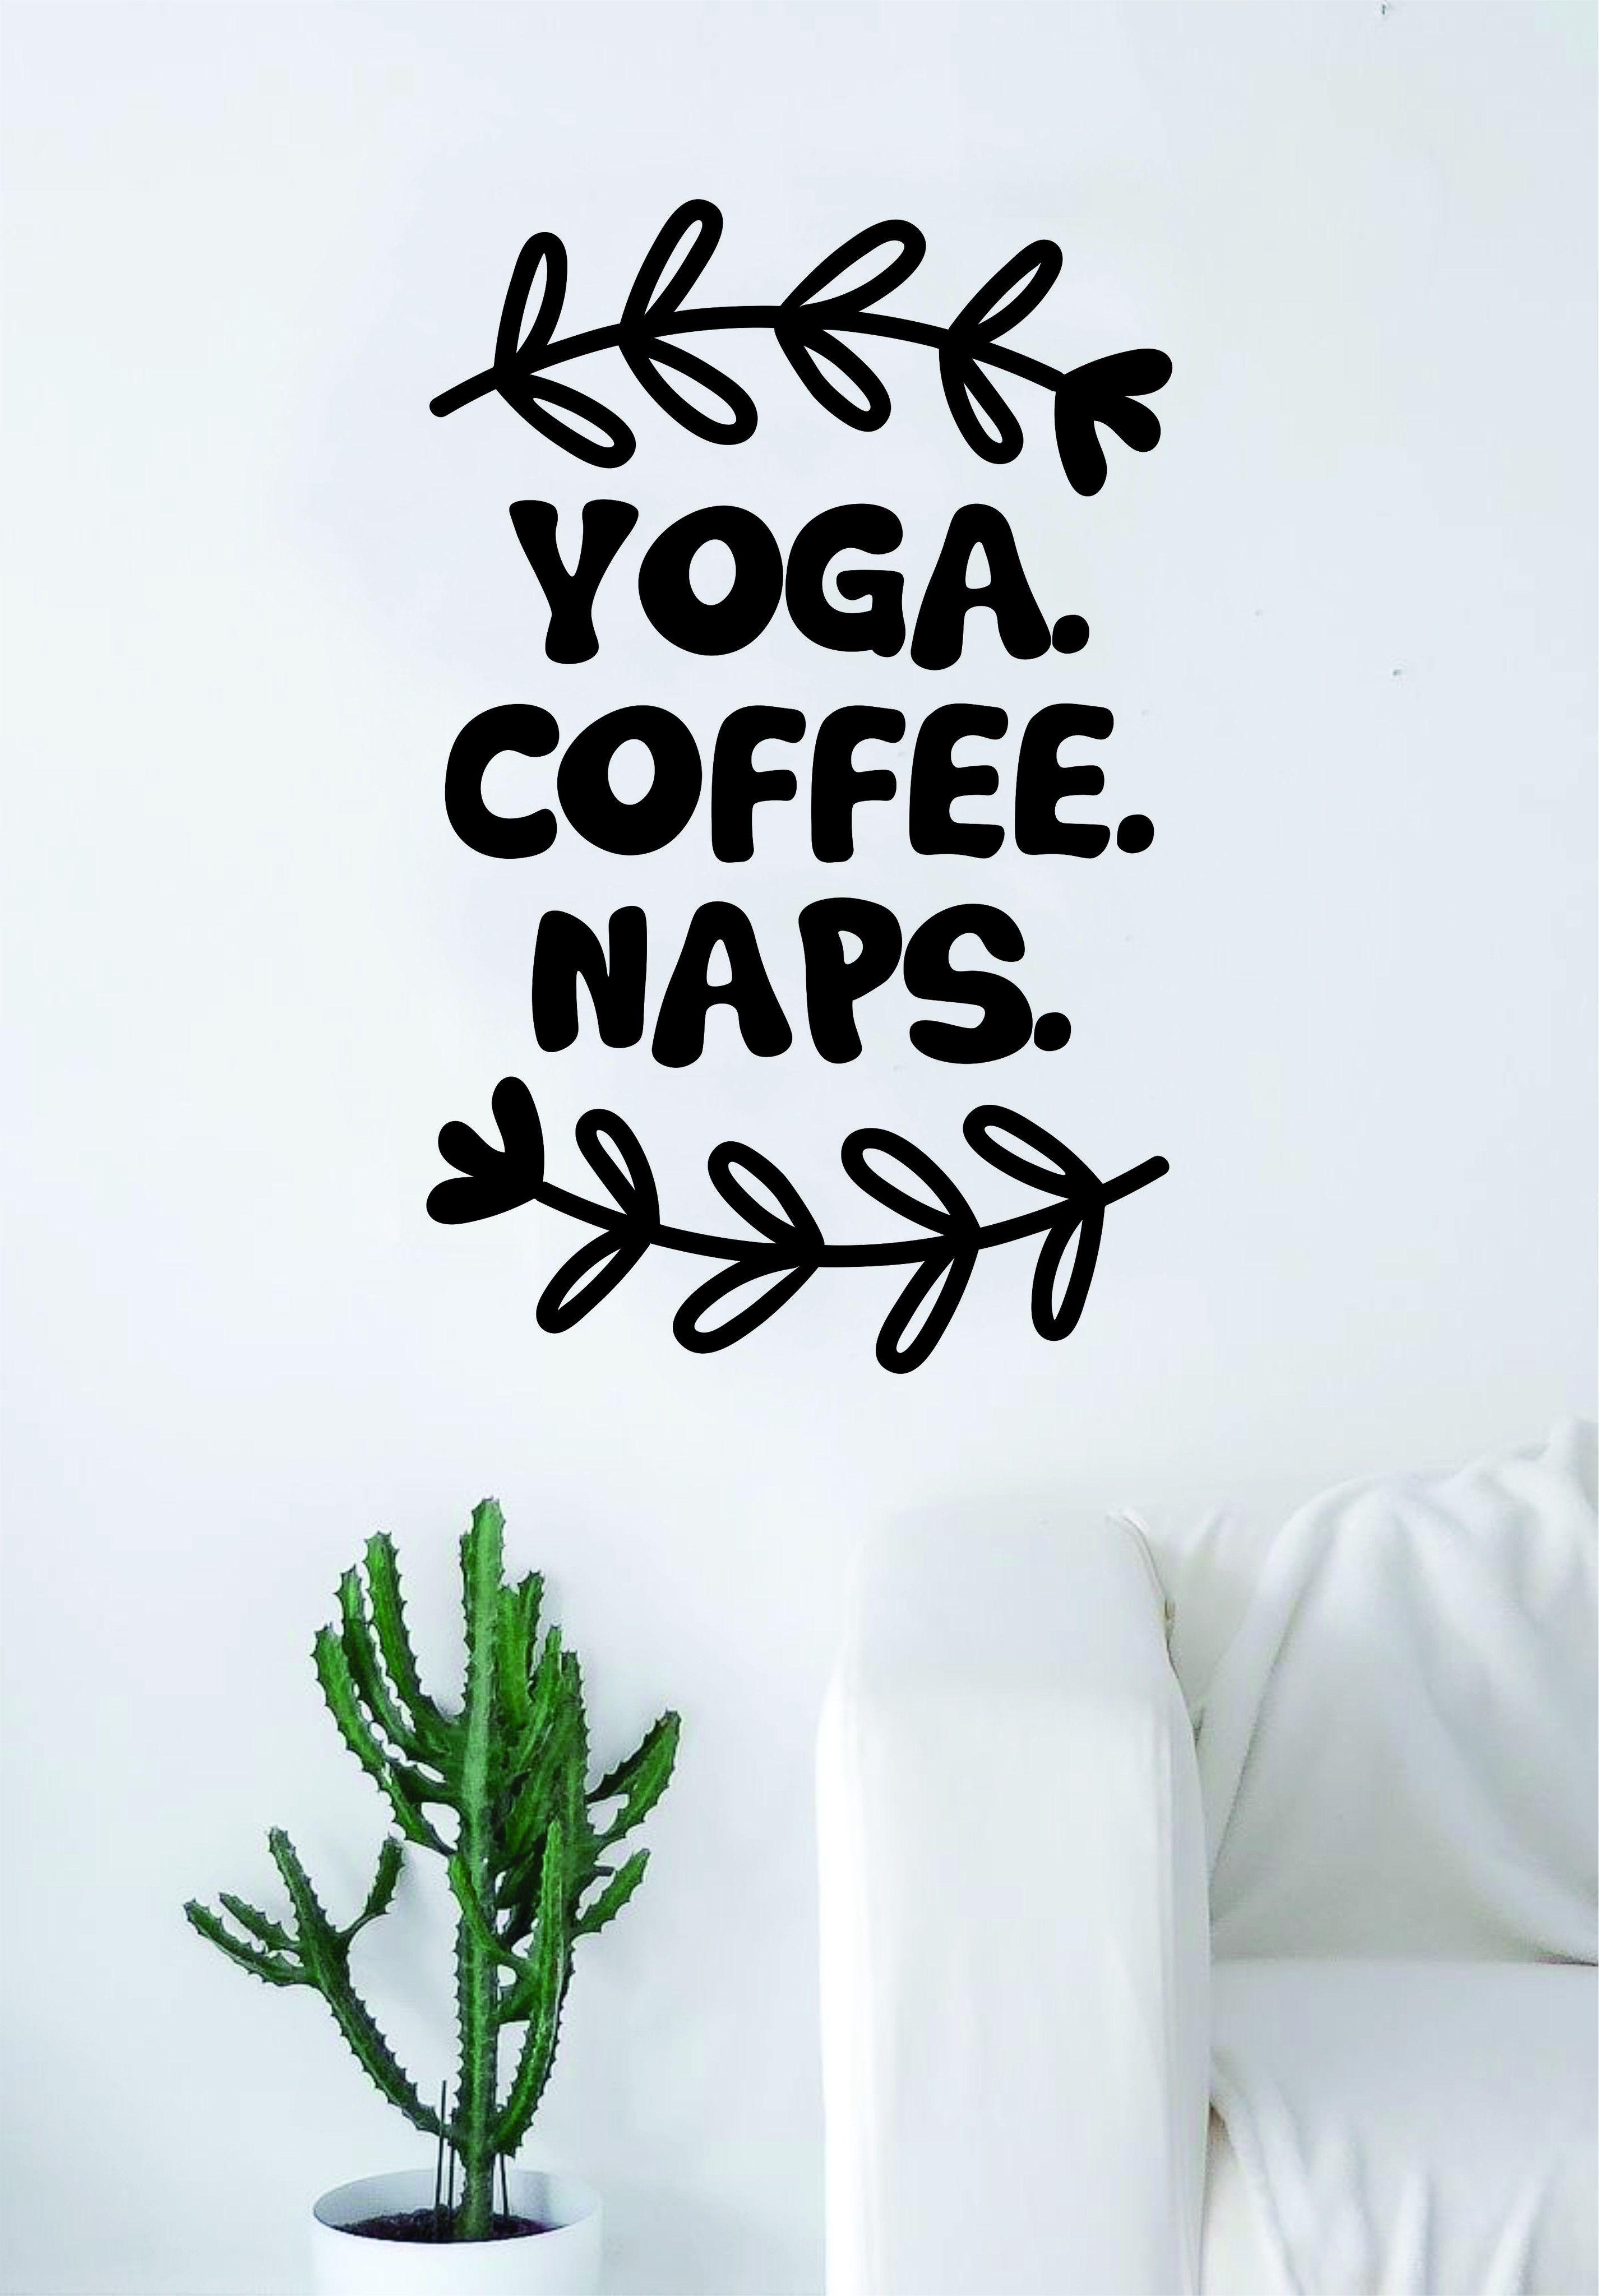 Yoga Coffee Naps Quote Wall Decal Sticker Room Art Vinyl Beautiful - Zen wall decals